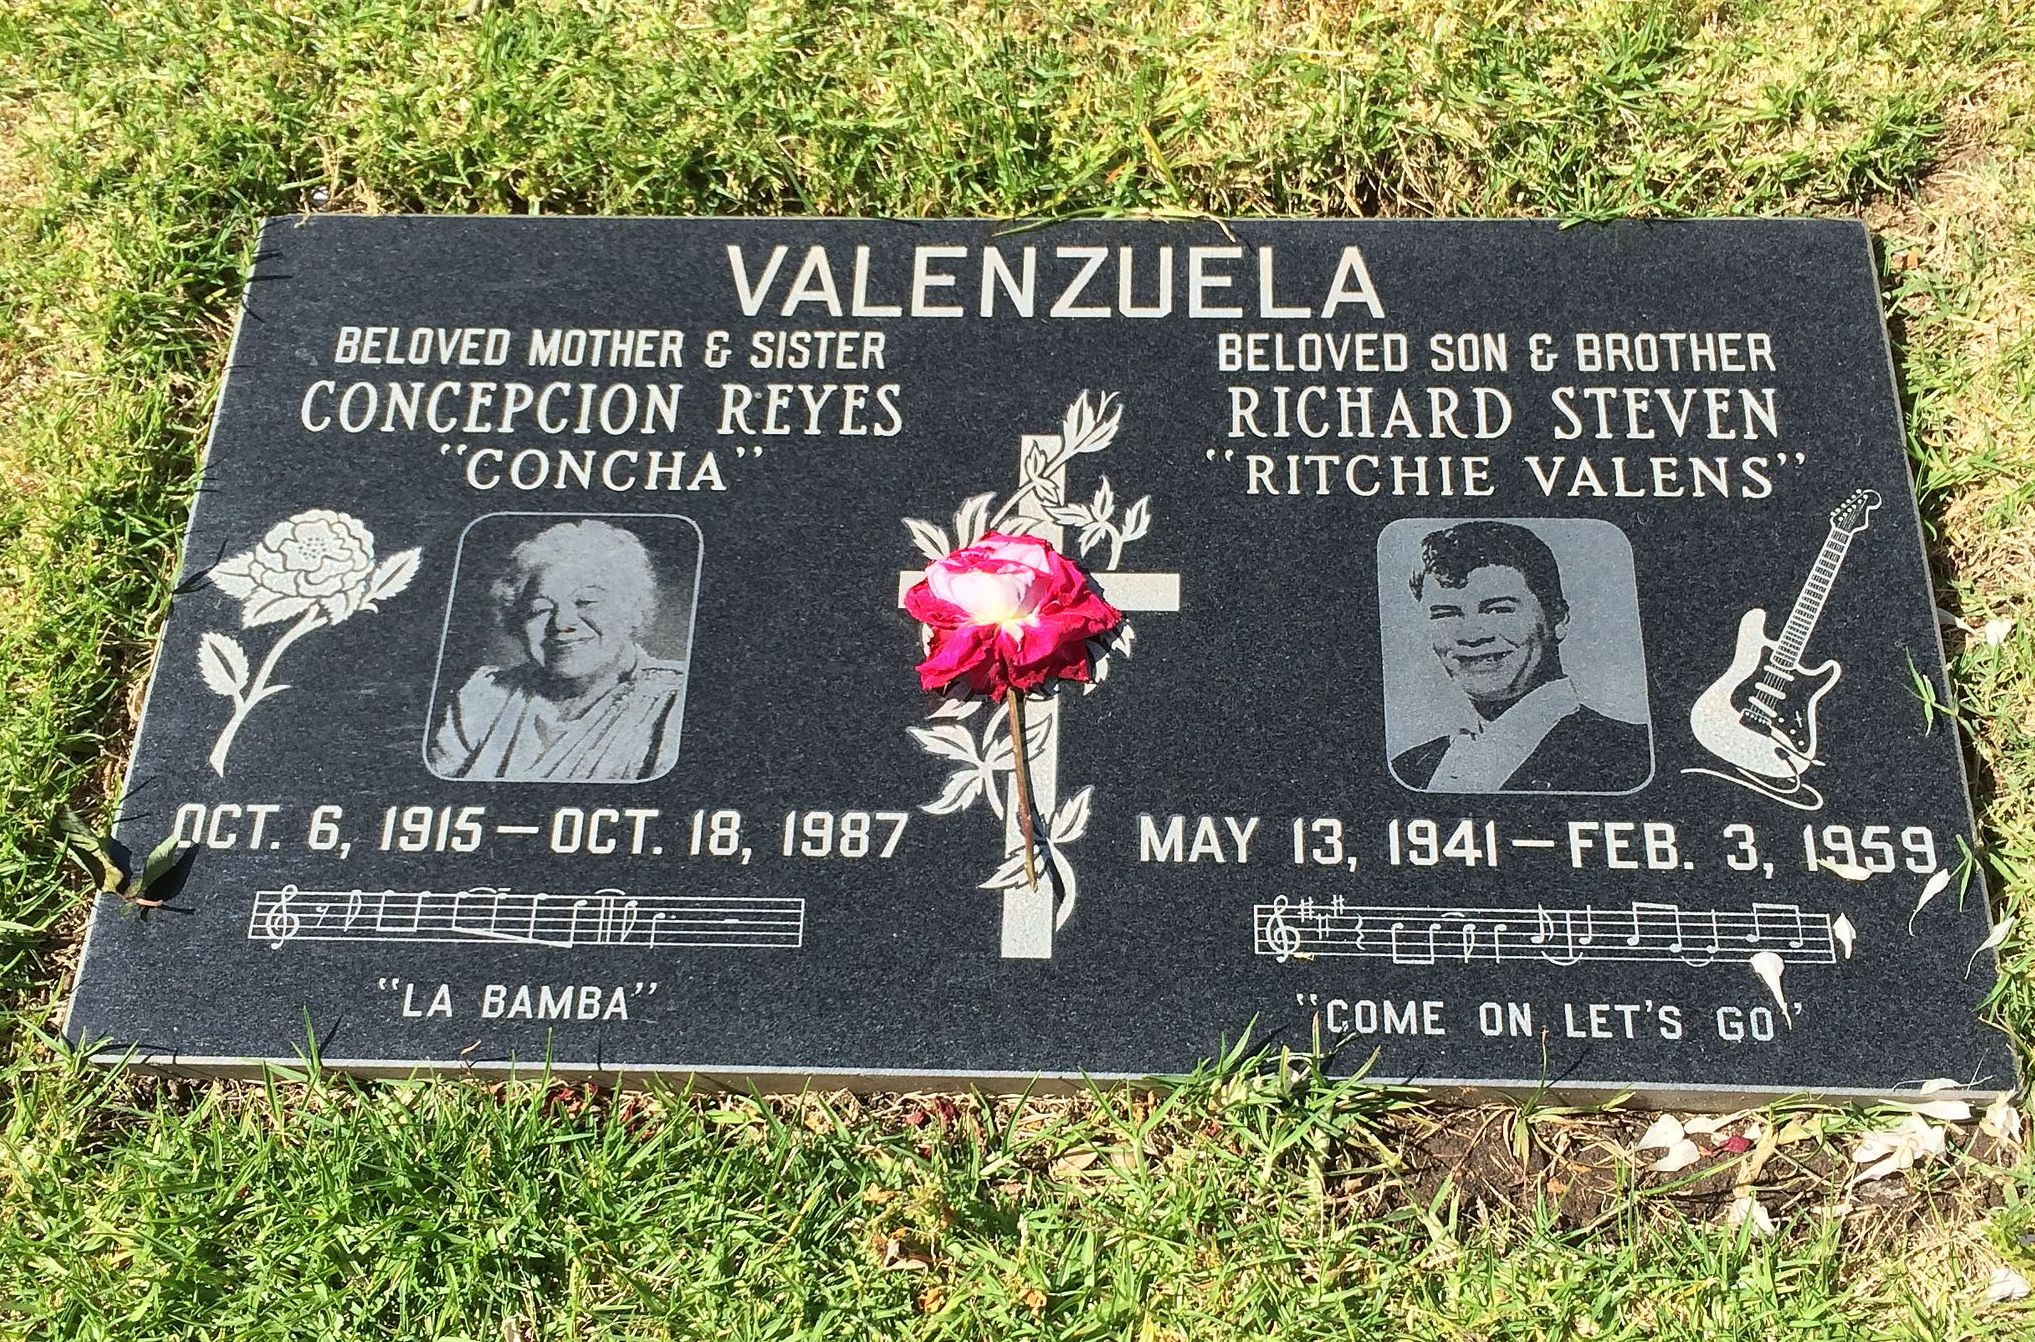 Ritchie Valens tombstone